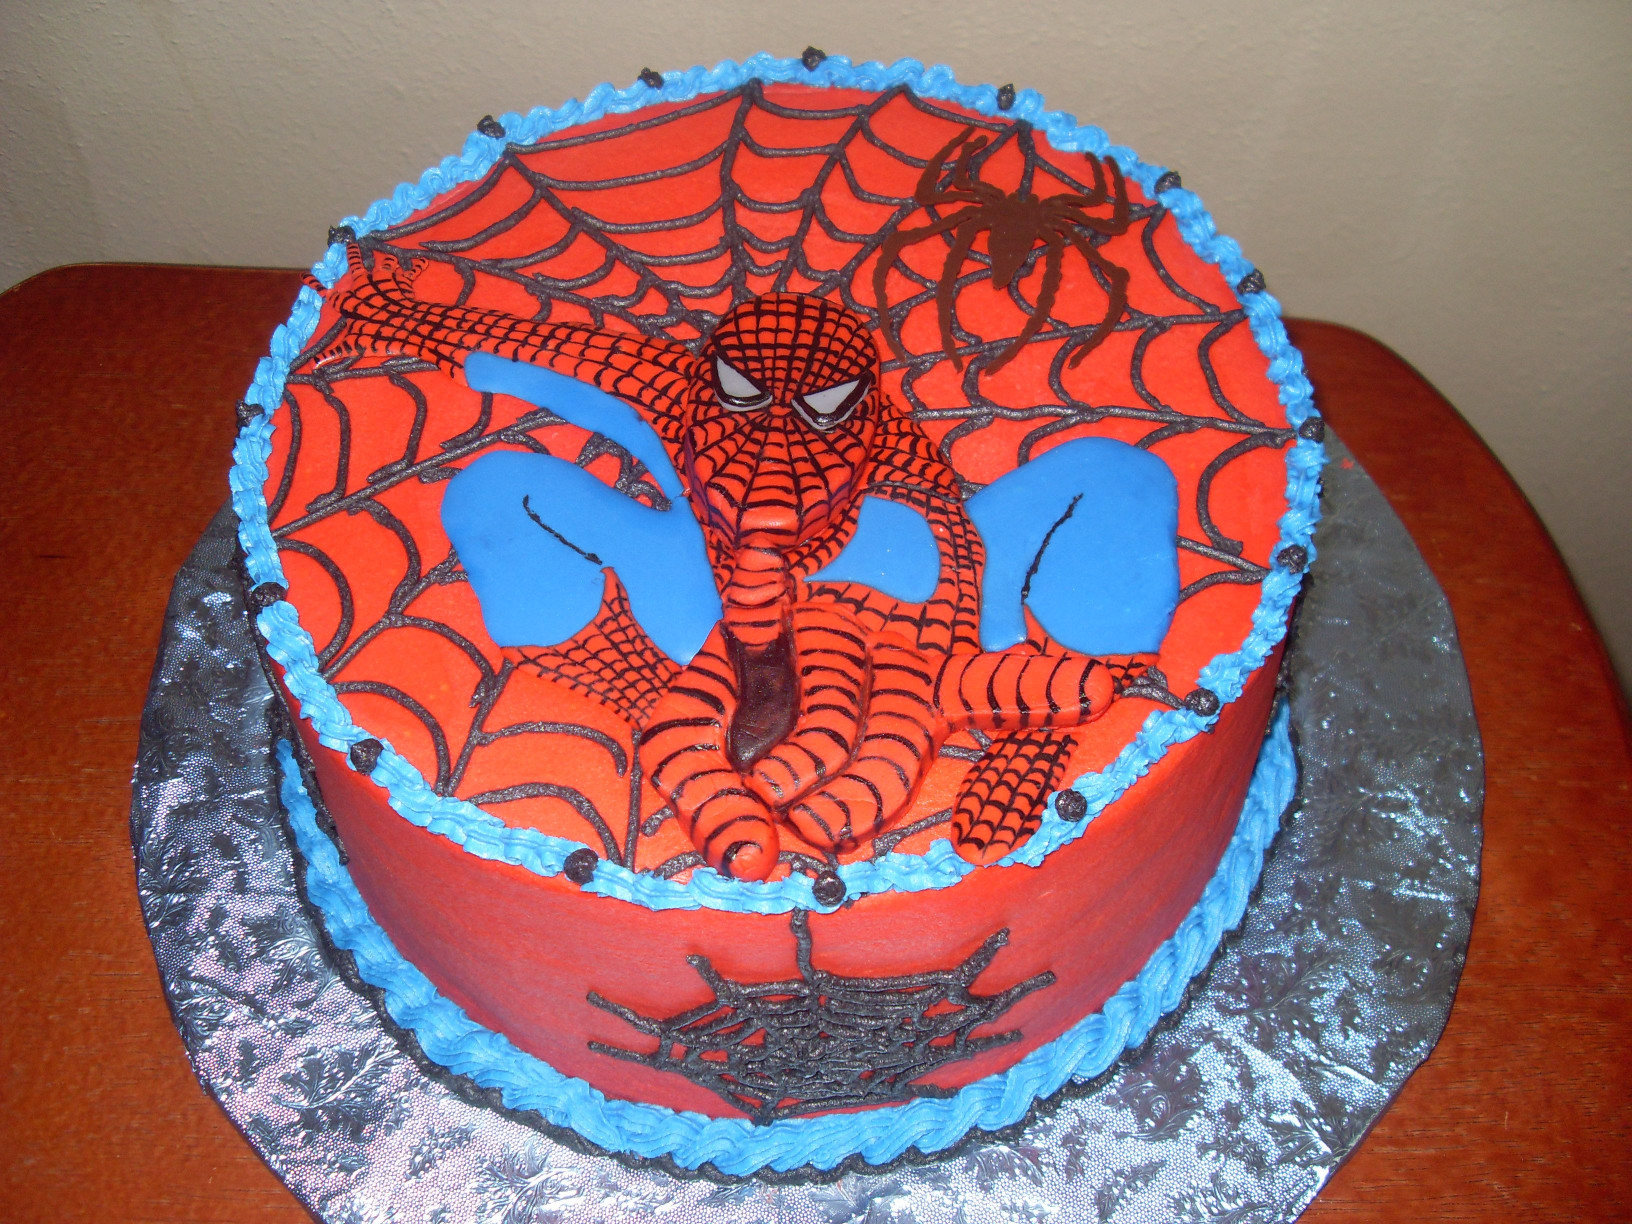 Spiderman Birthday Cake  Spiderman Cakes – Decoration Ideas